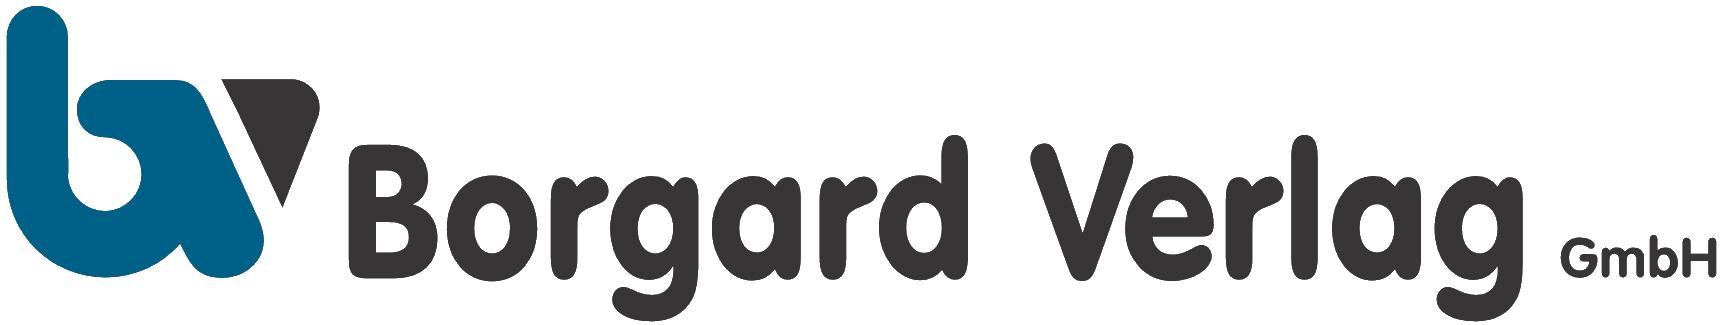 Borgard Verlag GmbH Logo